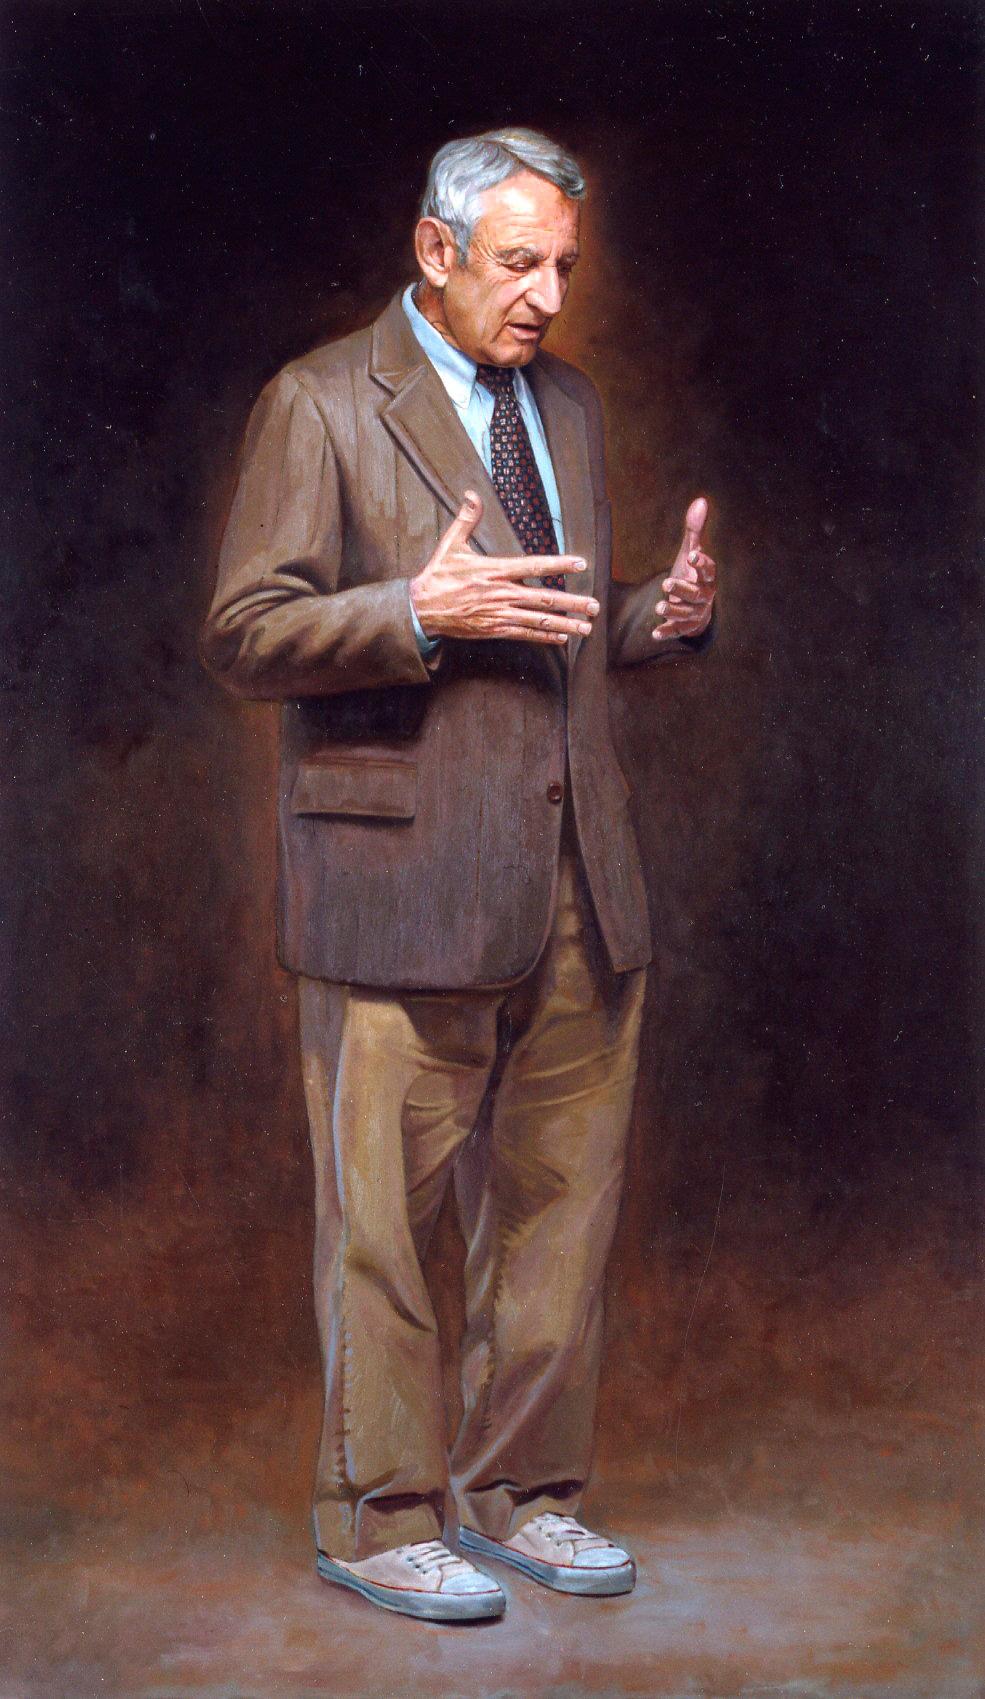 7-Charles-Reich-Augustus-E-Lines-Professor-Emeritus-of-Law-Yale-Law-School-oil_canvas-38x58-96x147cm.jpg